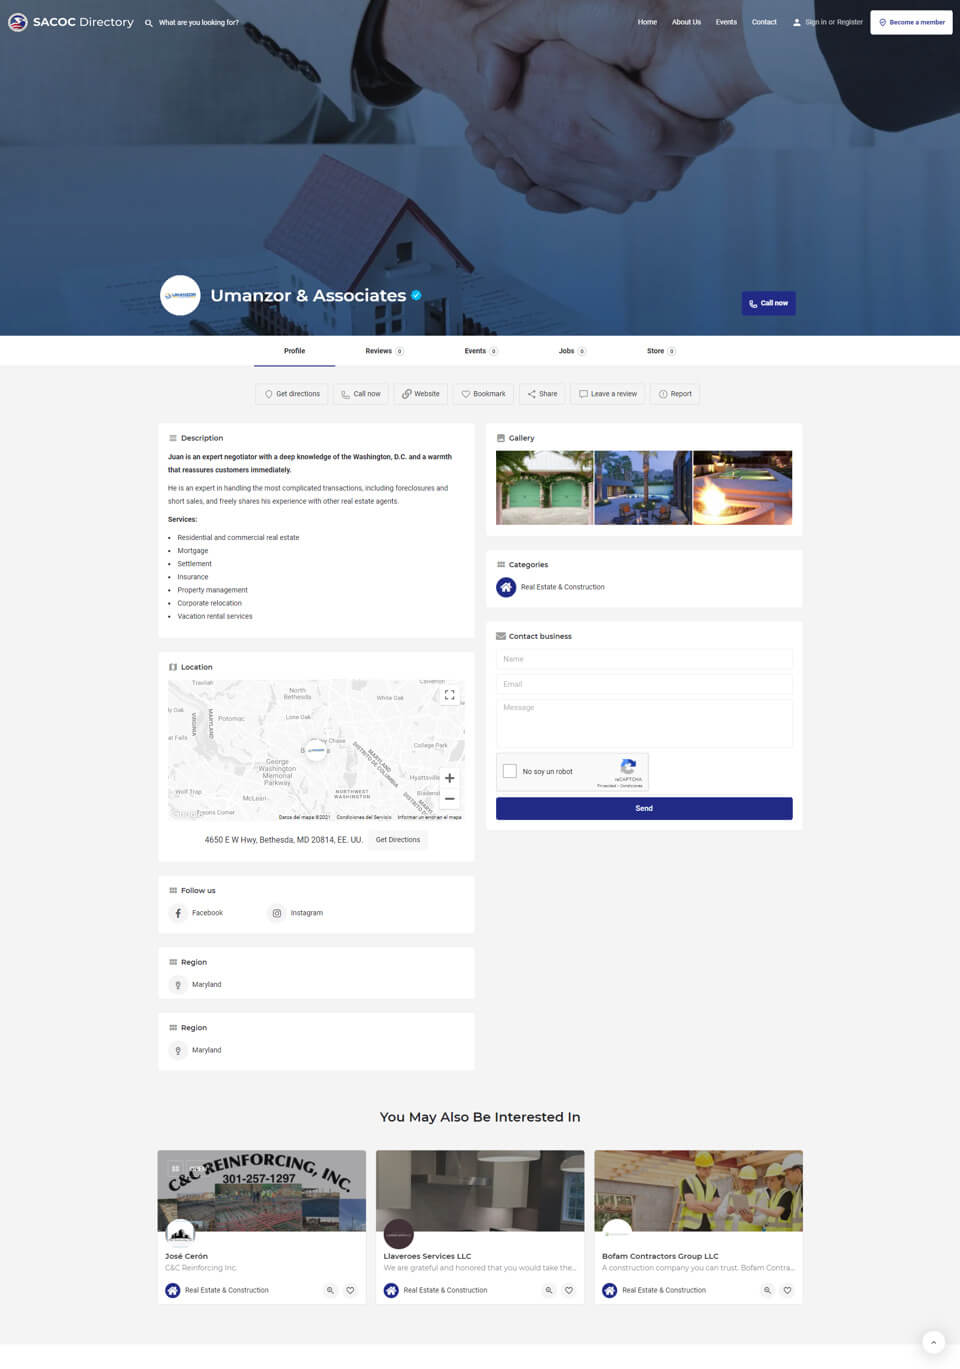 SACOC Directory